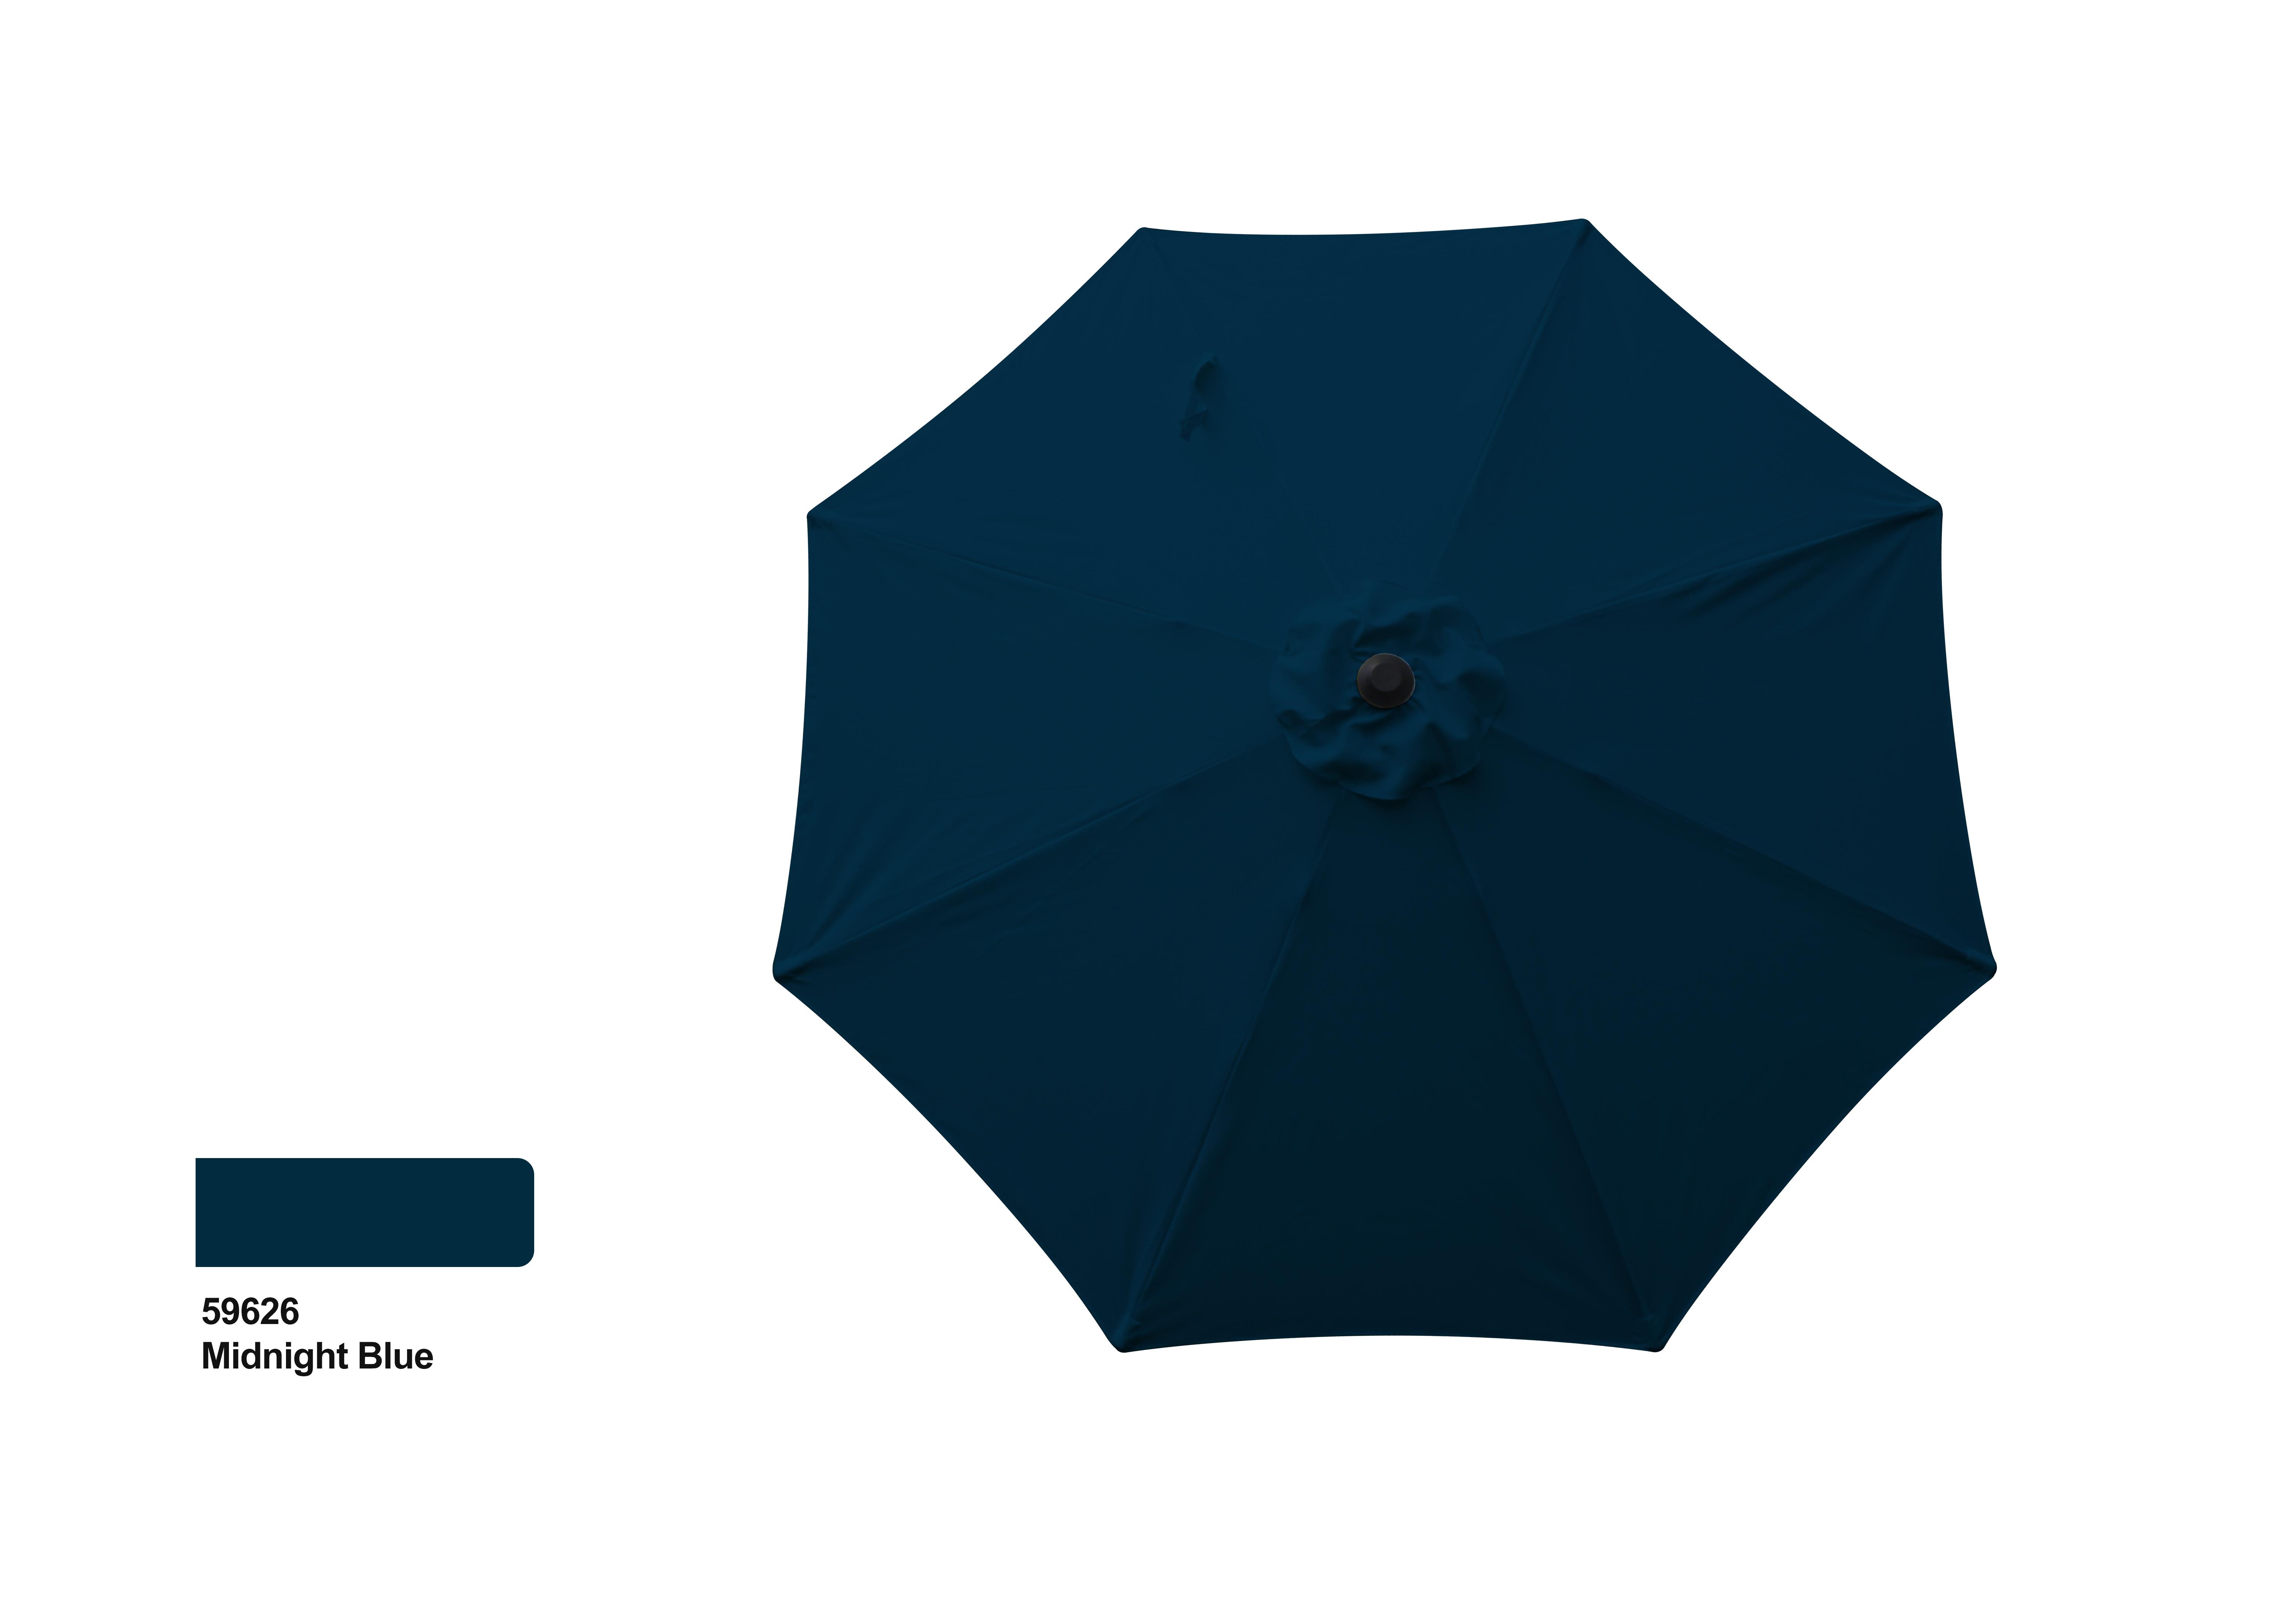 9' Aluminum Market Umbrella - Midnight Blue